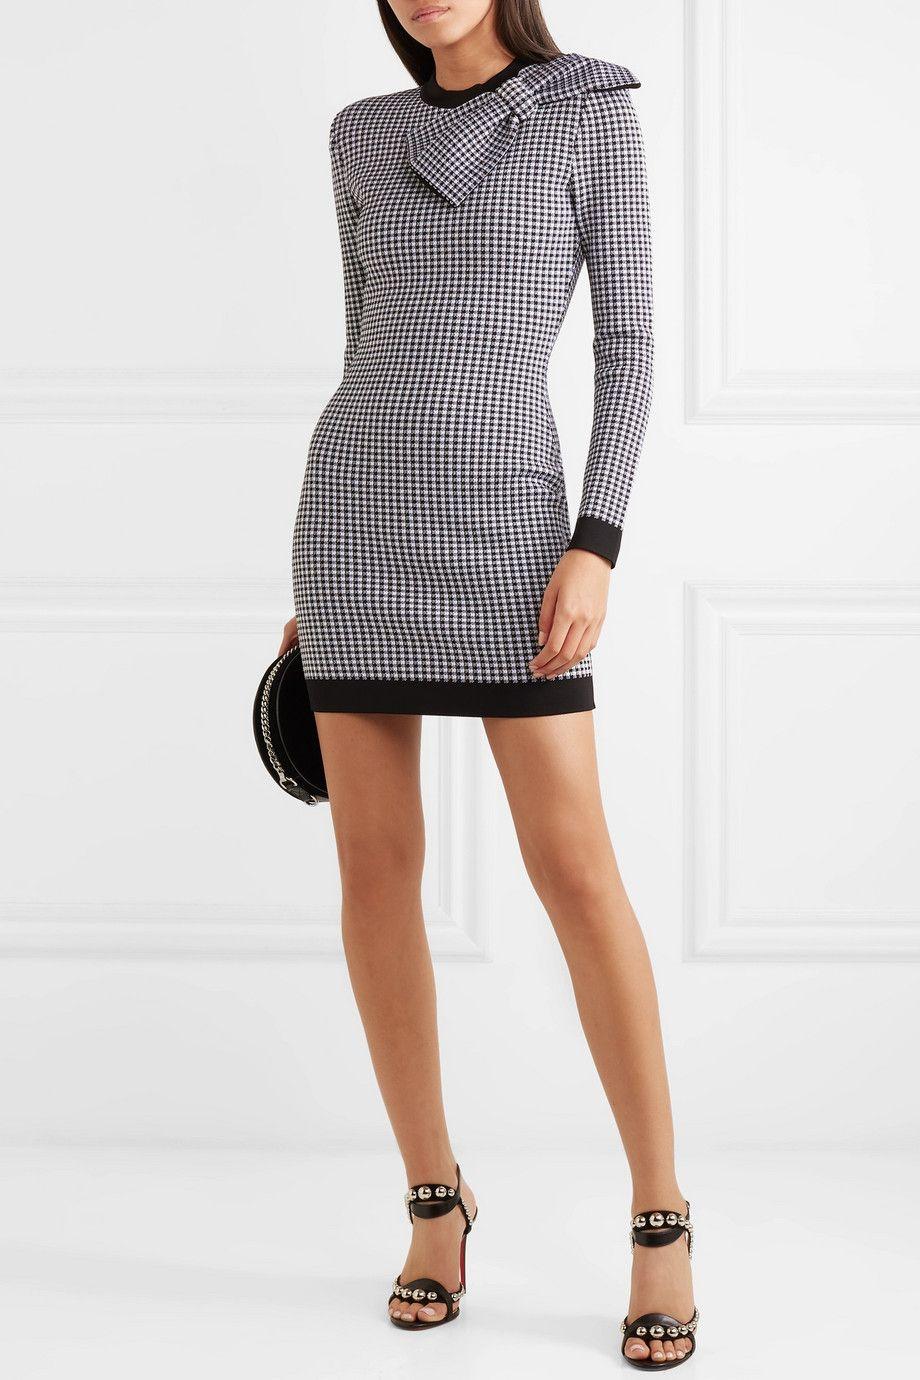 92246144 Balmain   Bow-embellished gingham stretch-knit mini dress   Fashion ...